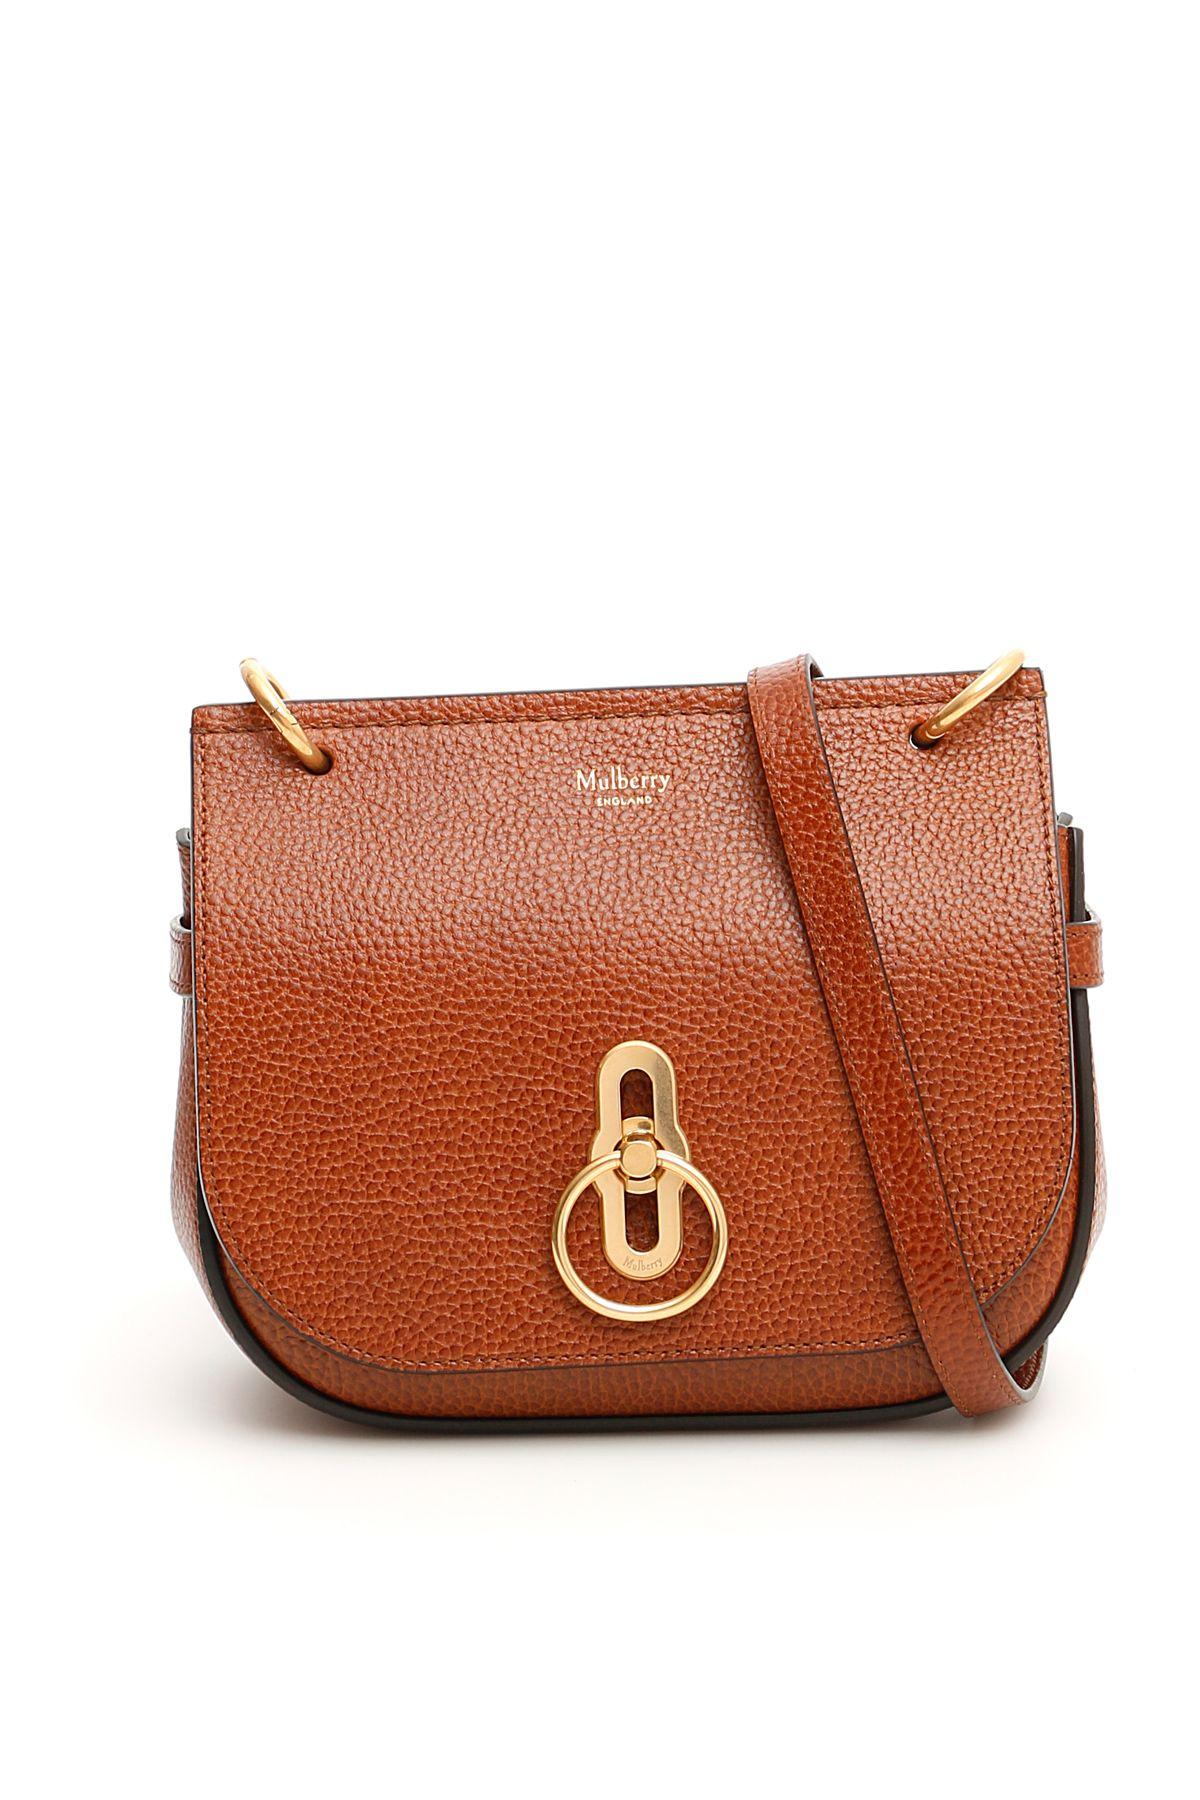 Amberley Small Bag in Oak